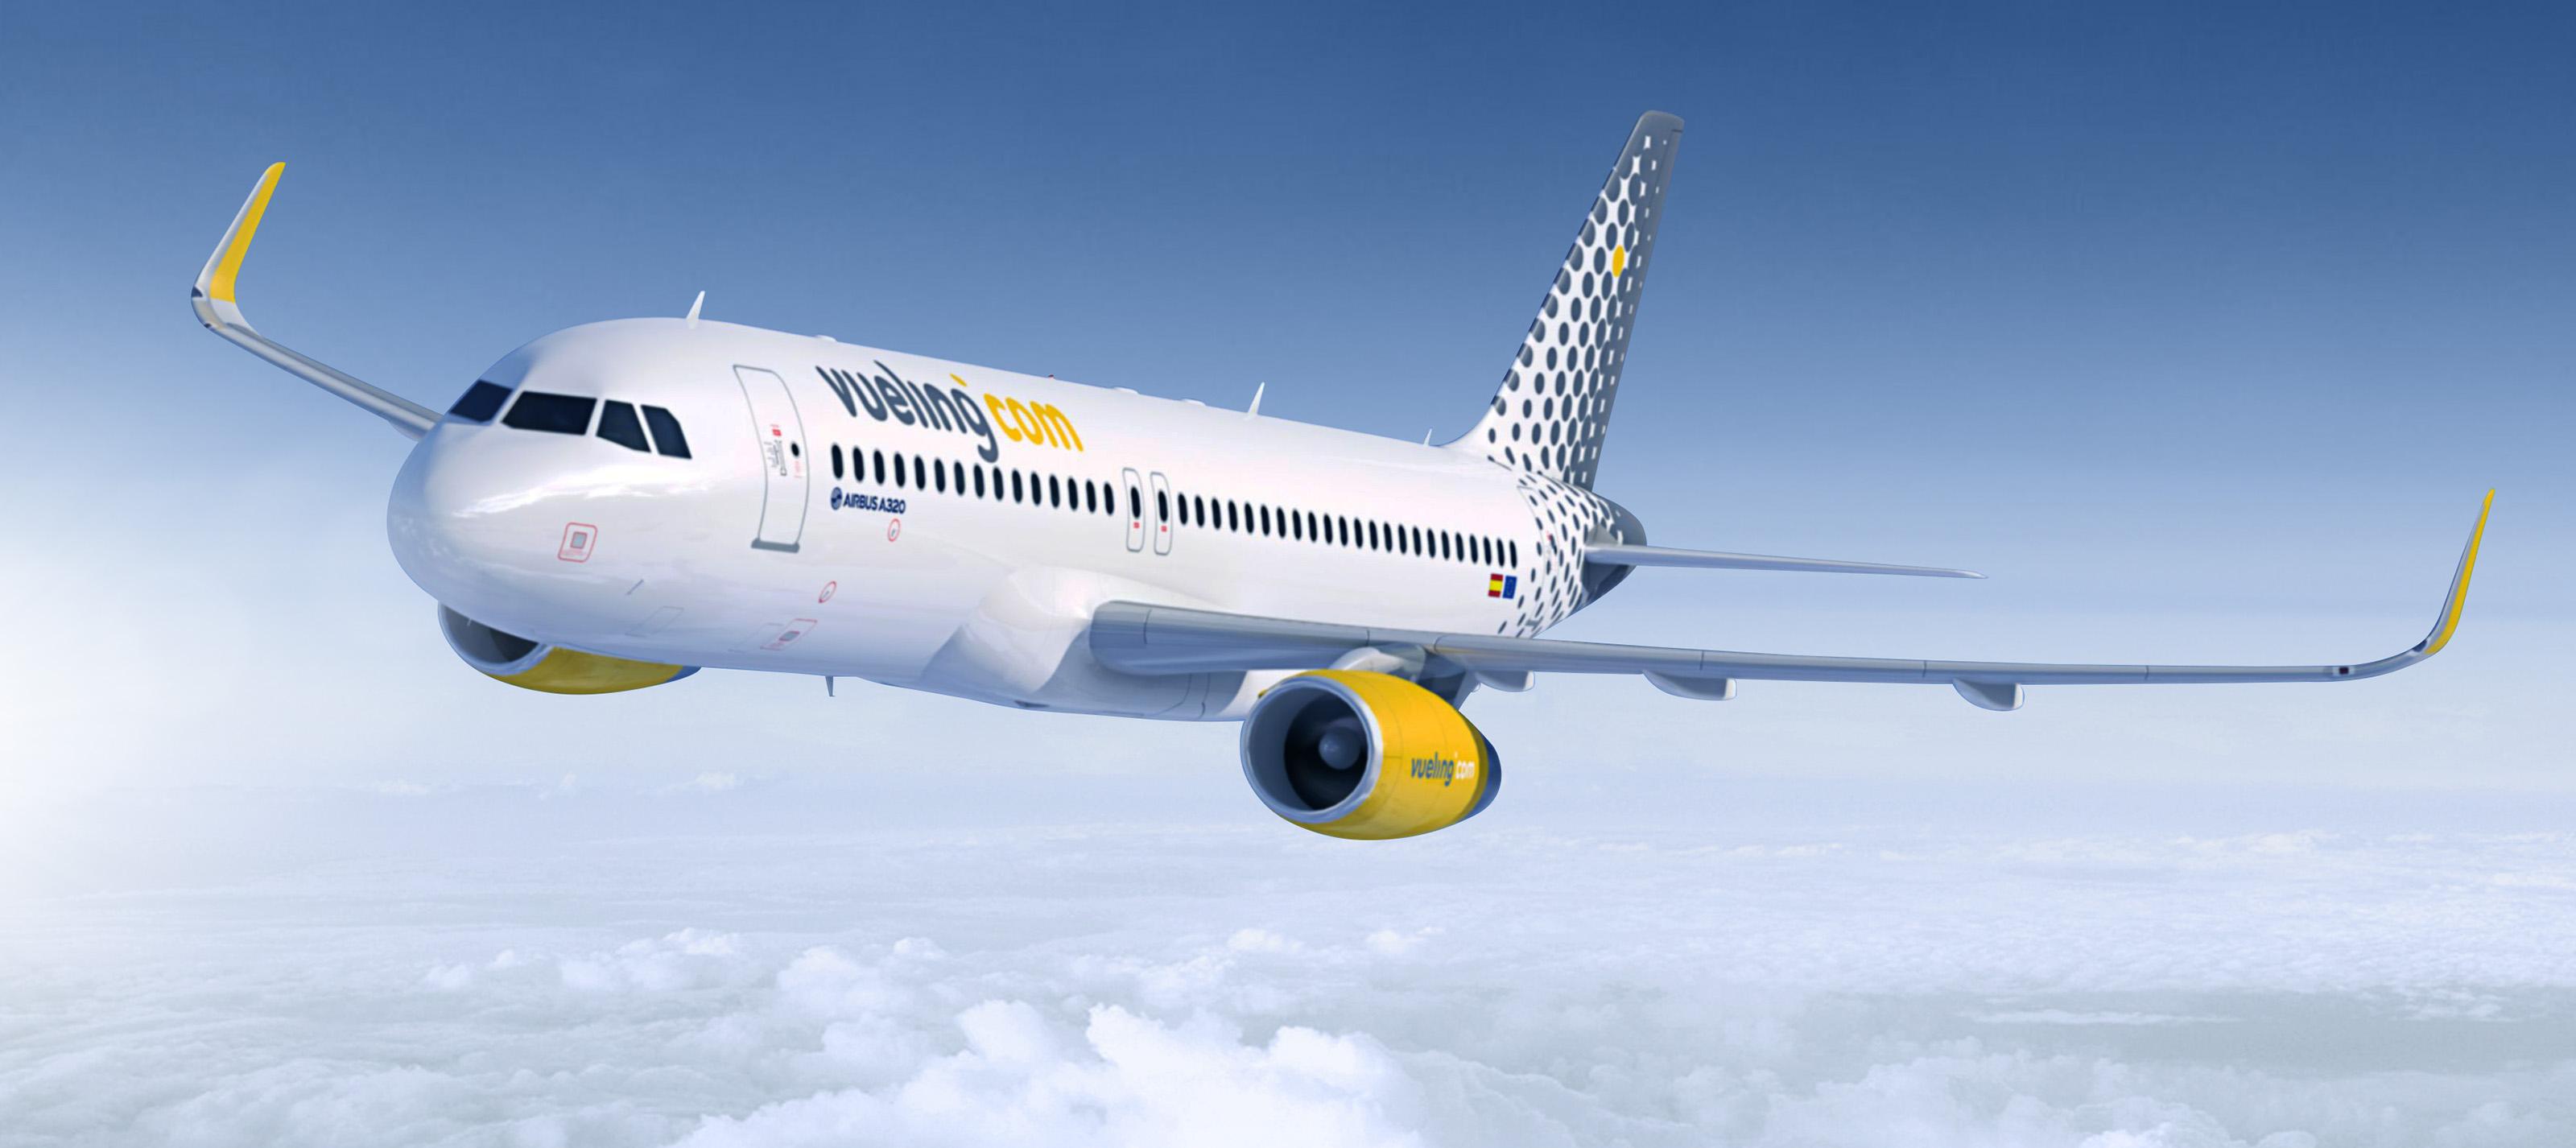 100-header-flying-plane-copy.jpg